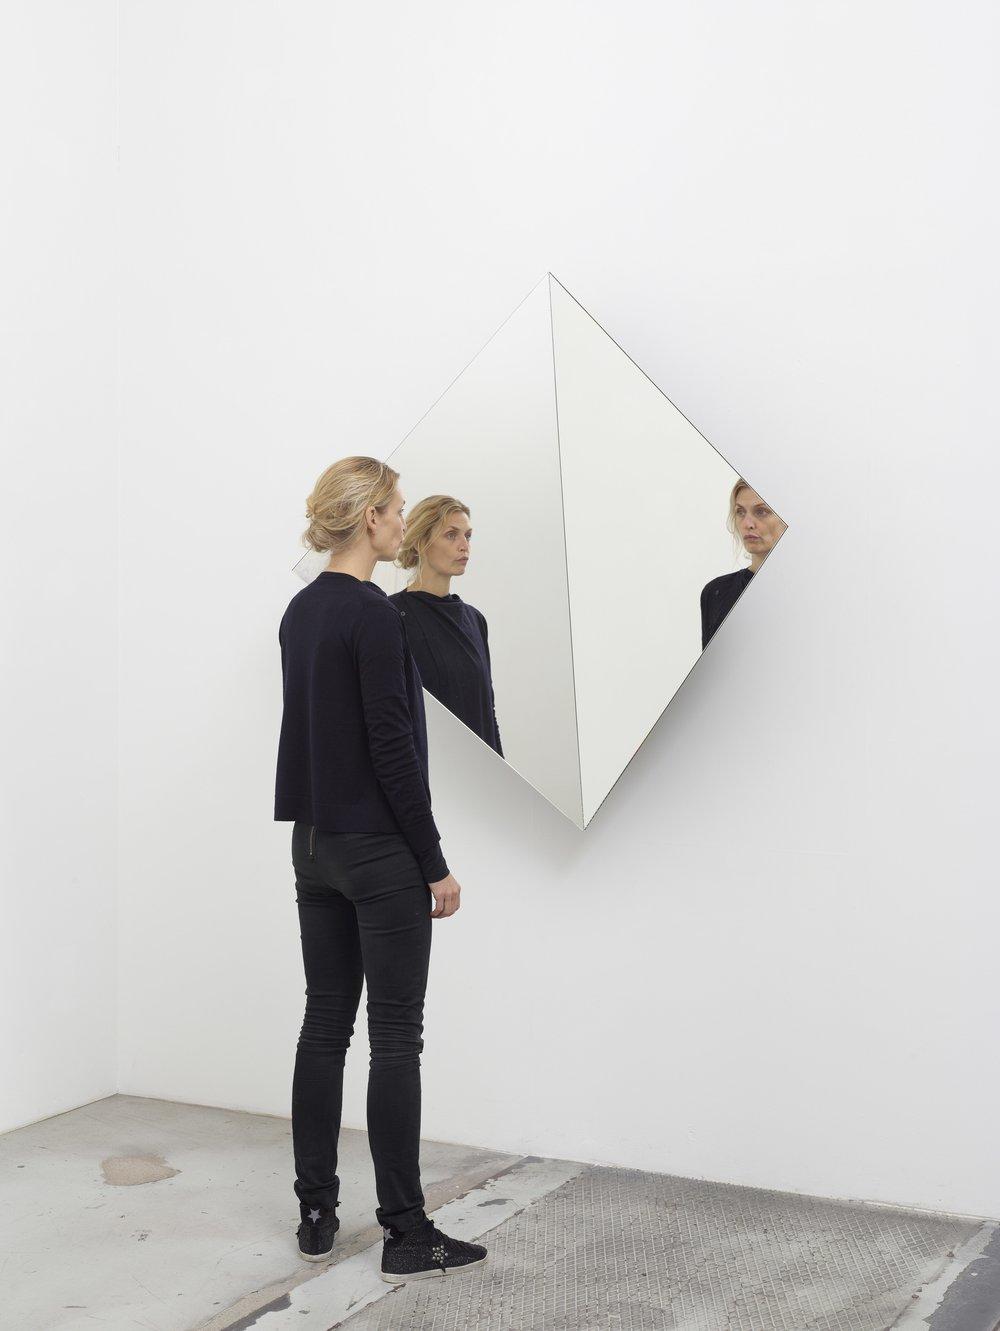 image:http://www.villaempain.com/en/20-septembre-2017-exposition-ways-of-seeing/